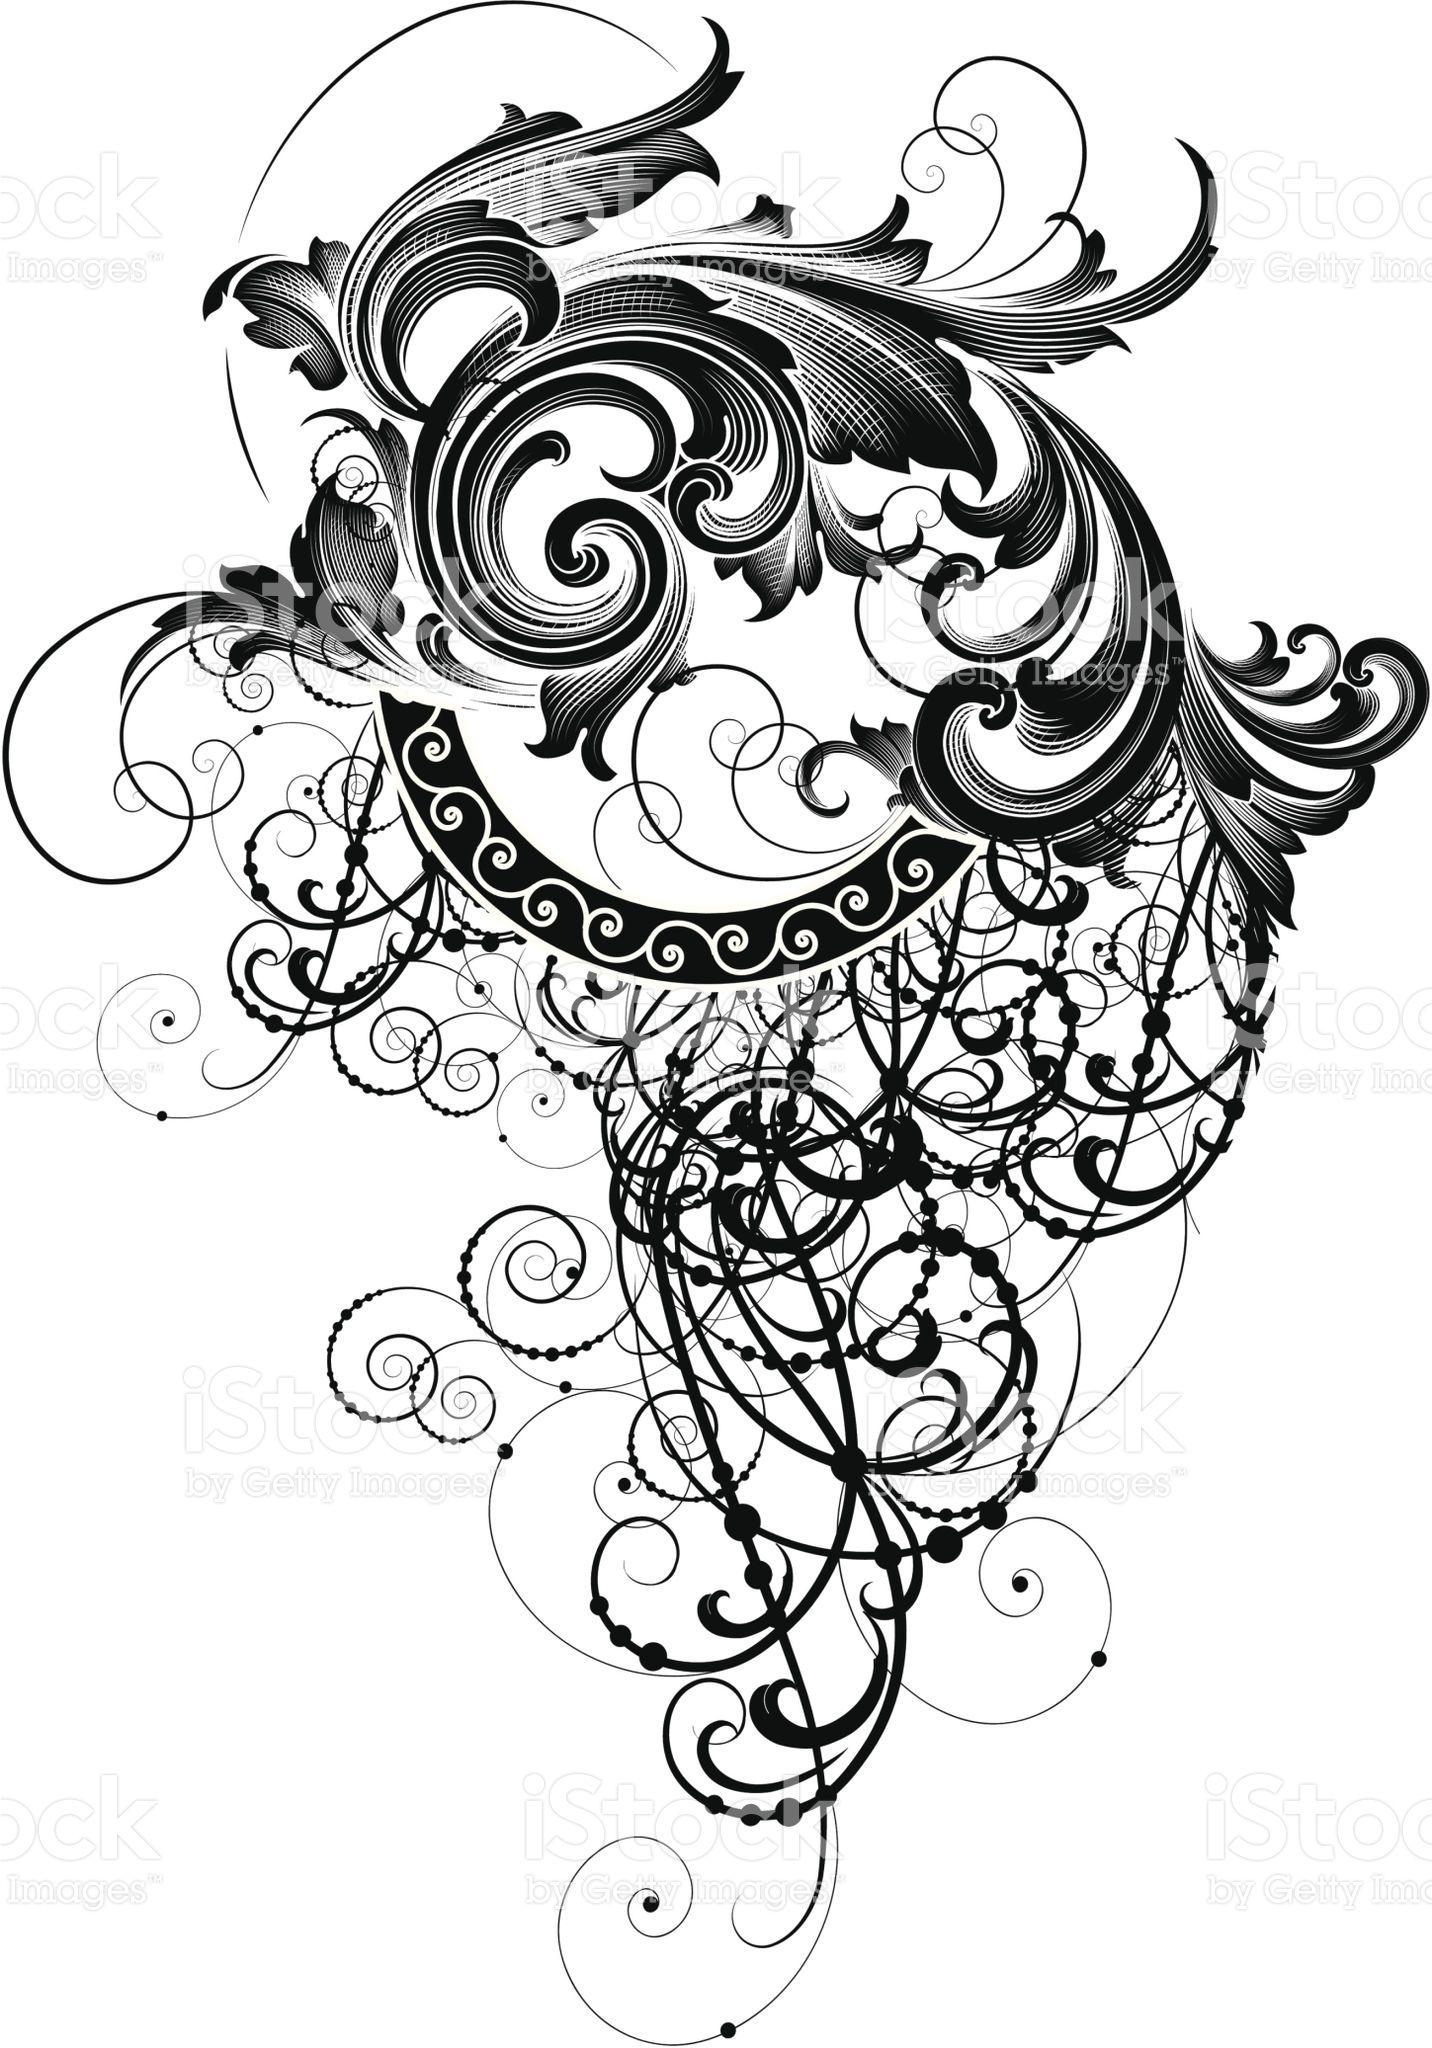 Desing Gothic Tattoo Gorgeous Tattoos Hand Engraving